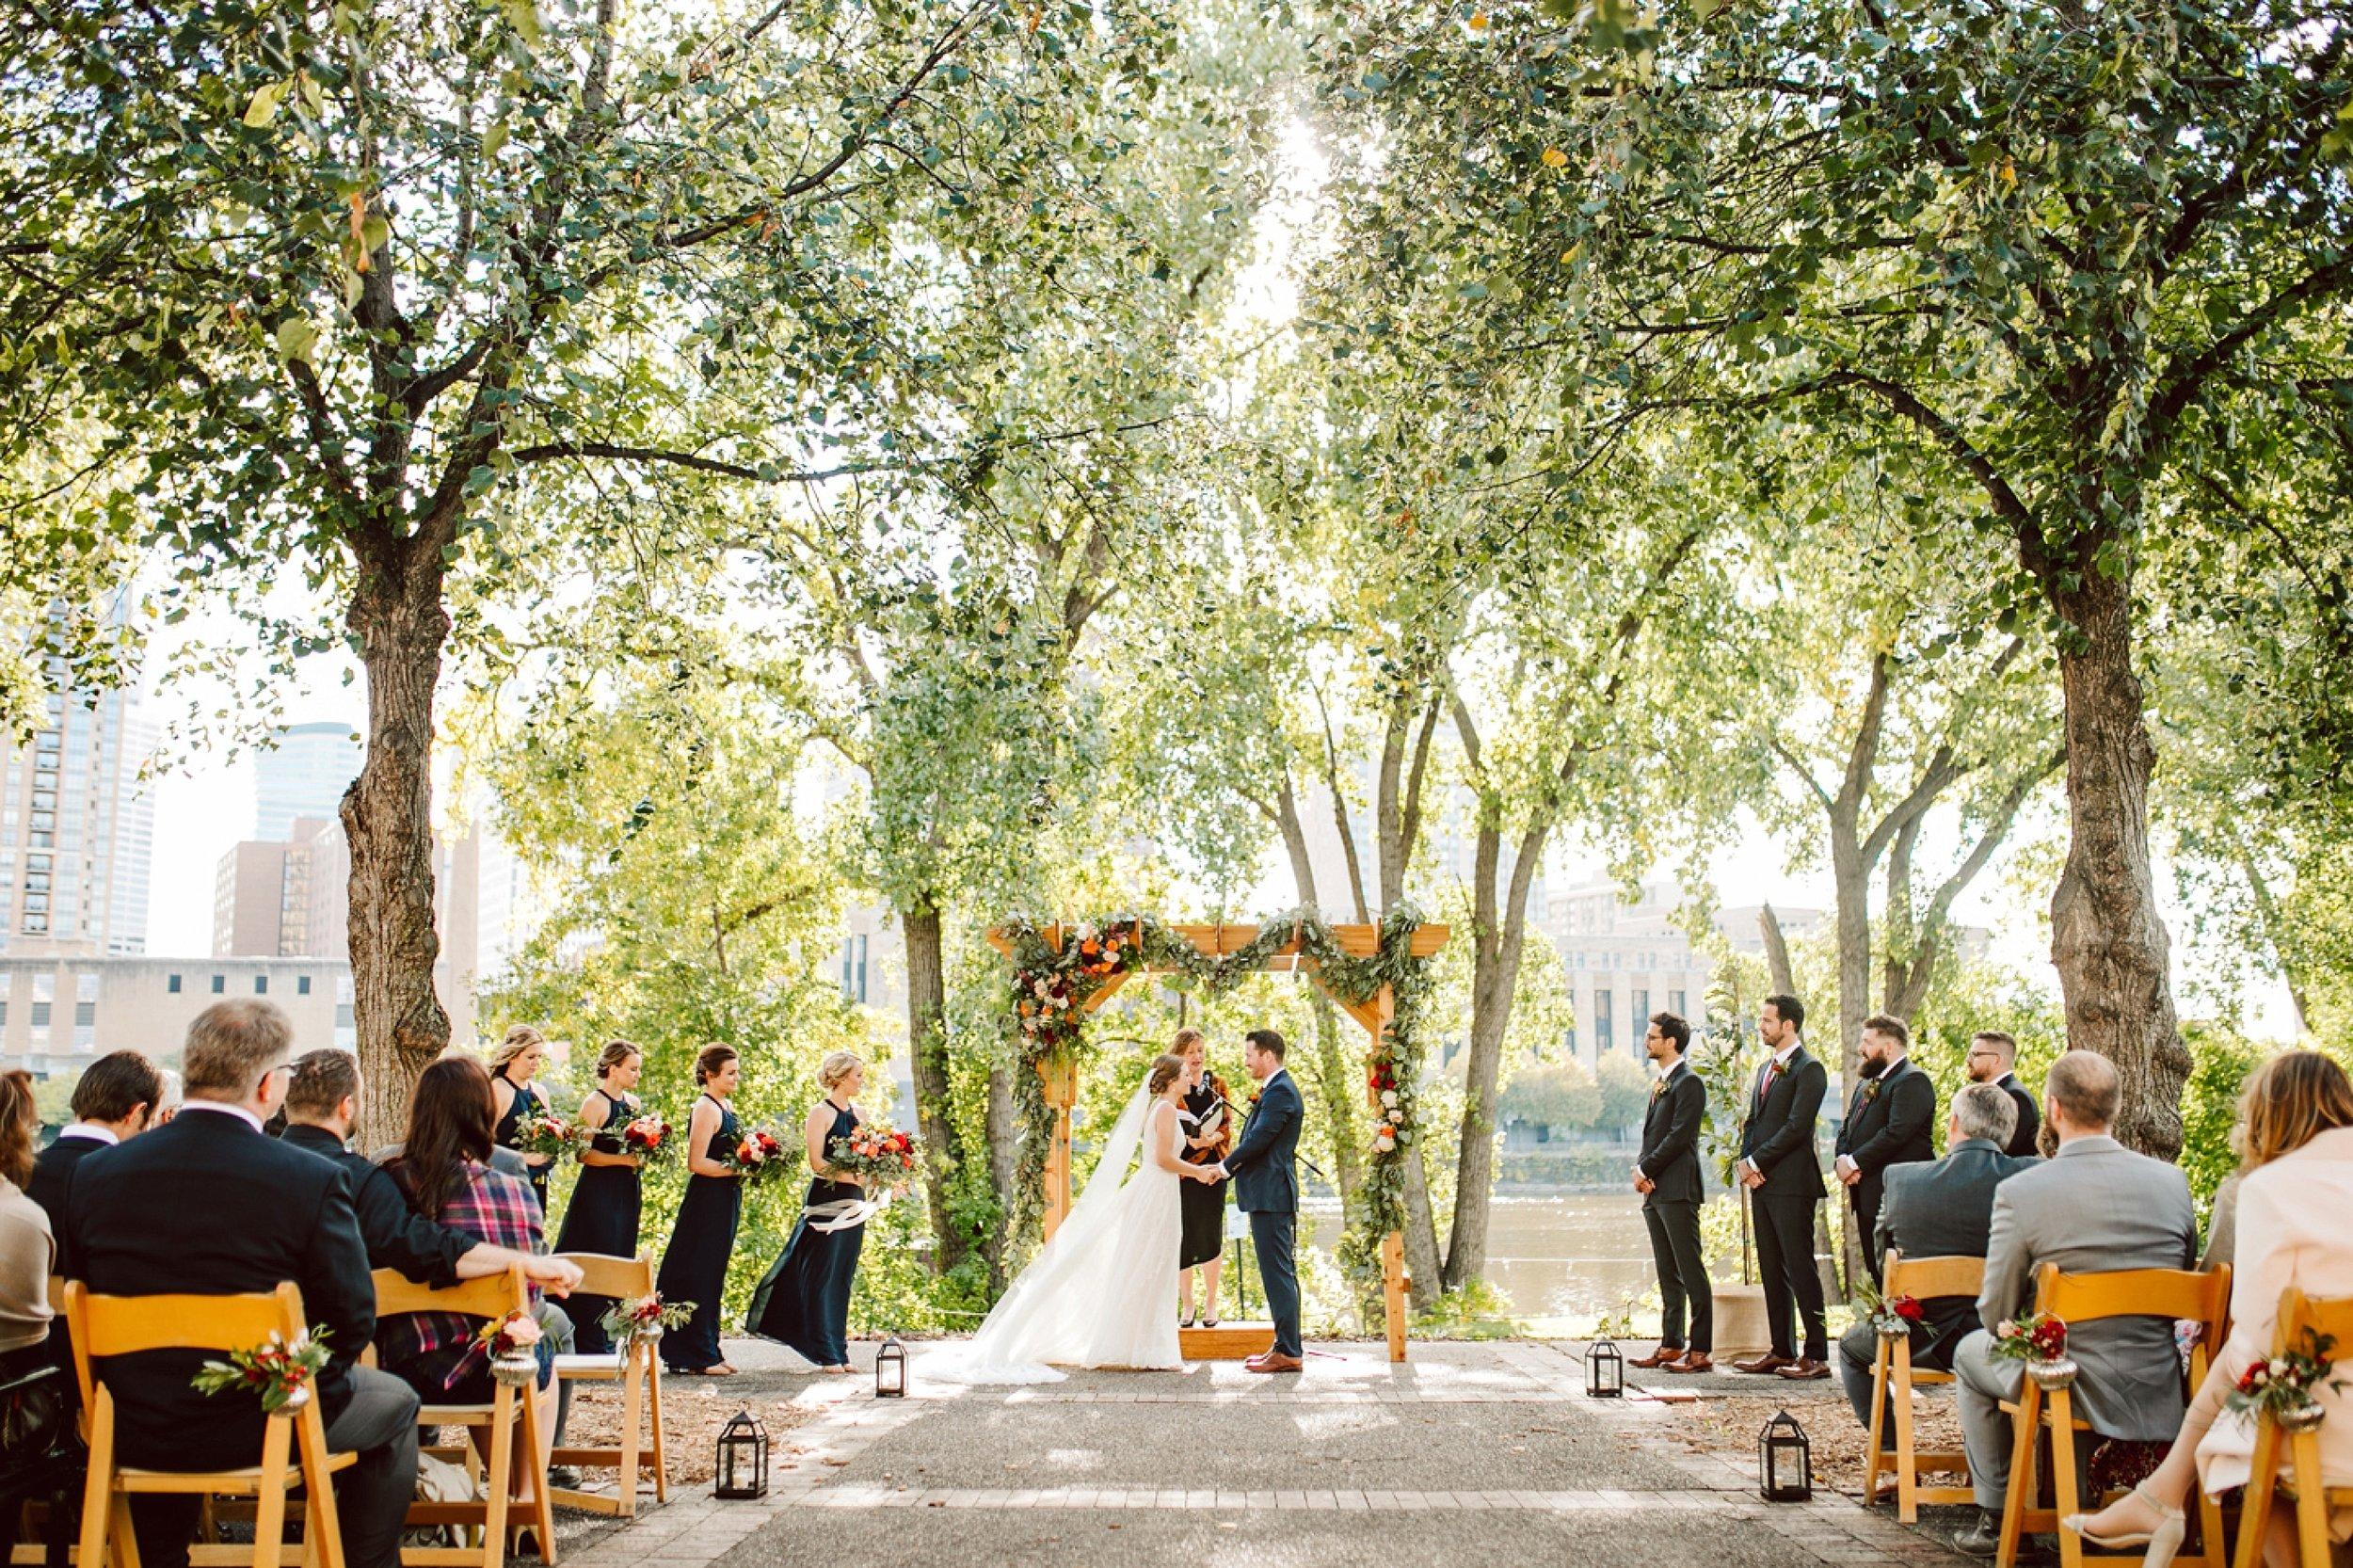 Nicollet-Island-Pavilion-Minneapolis-September-Coral-Navy-Wedding-105.jpg